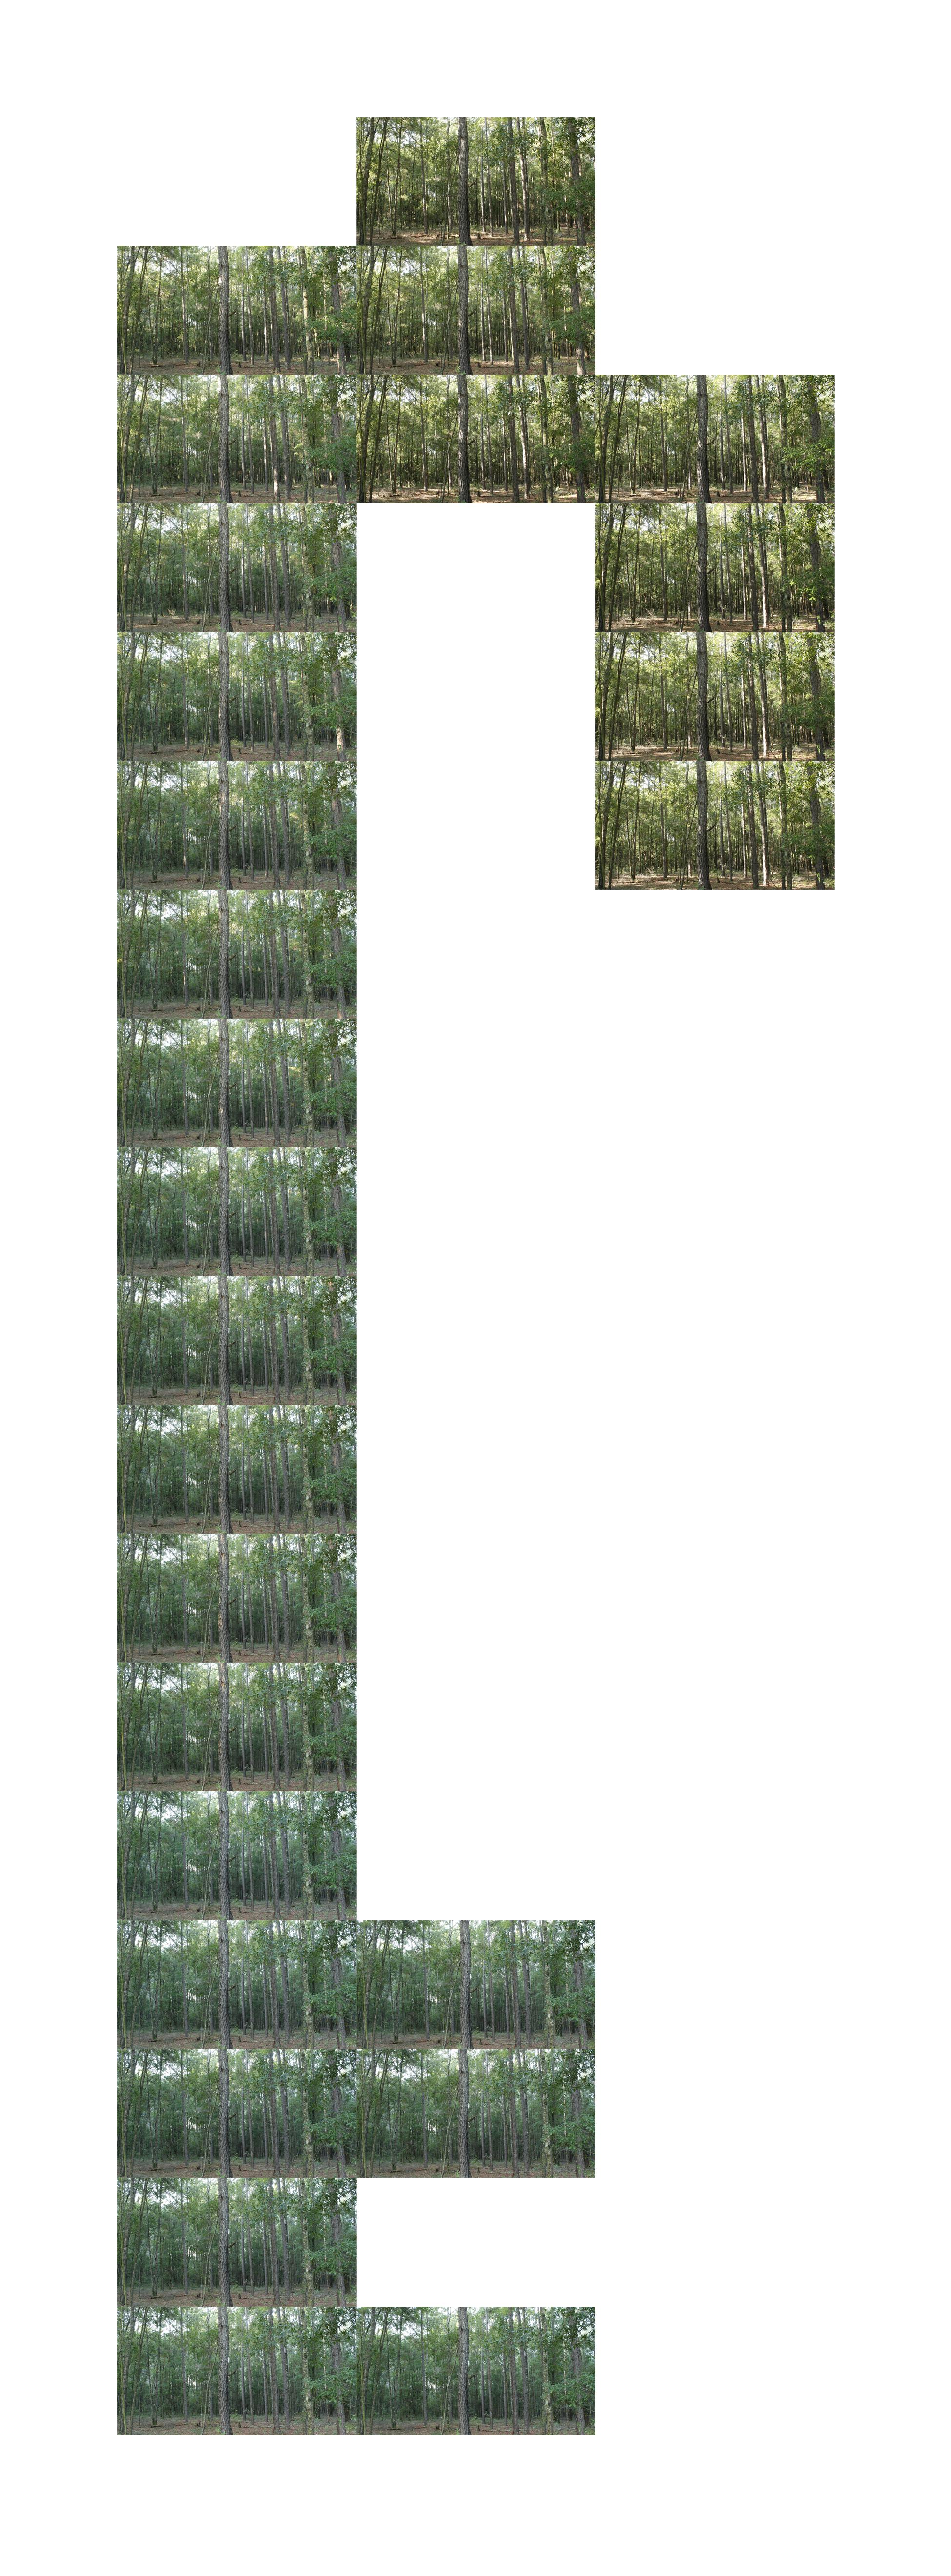 5_Pine Flat Wood Forest in July.jpg